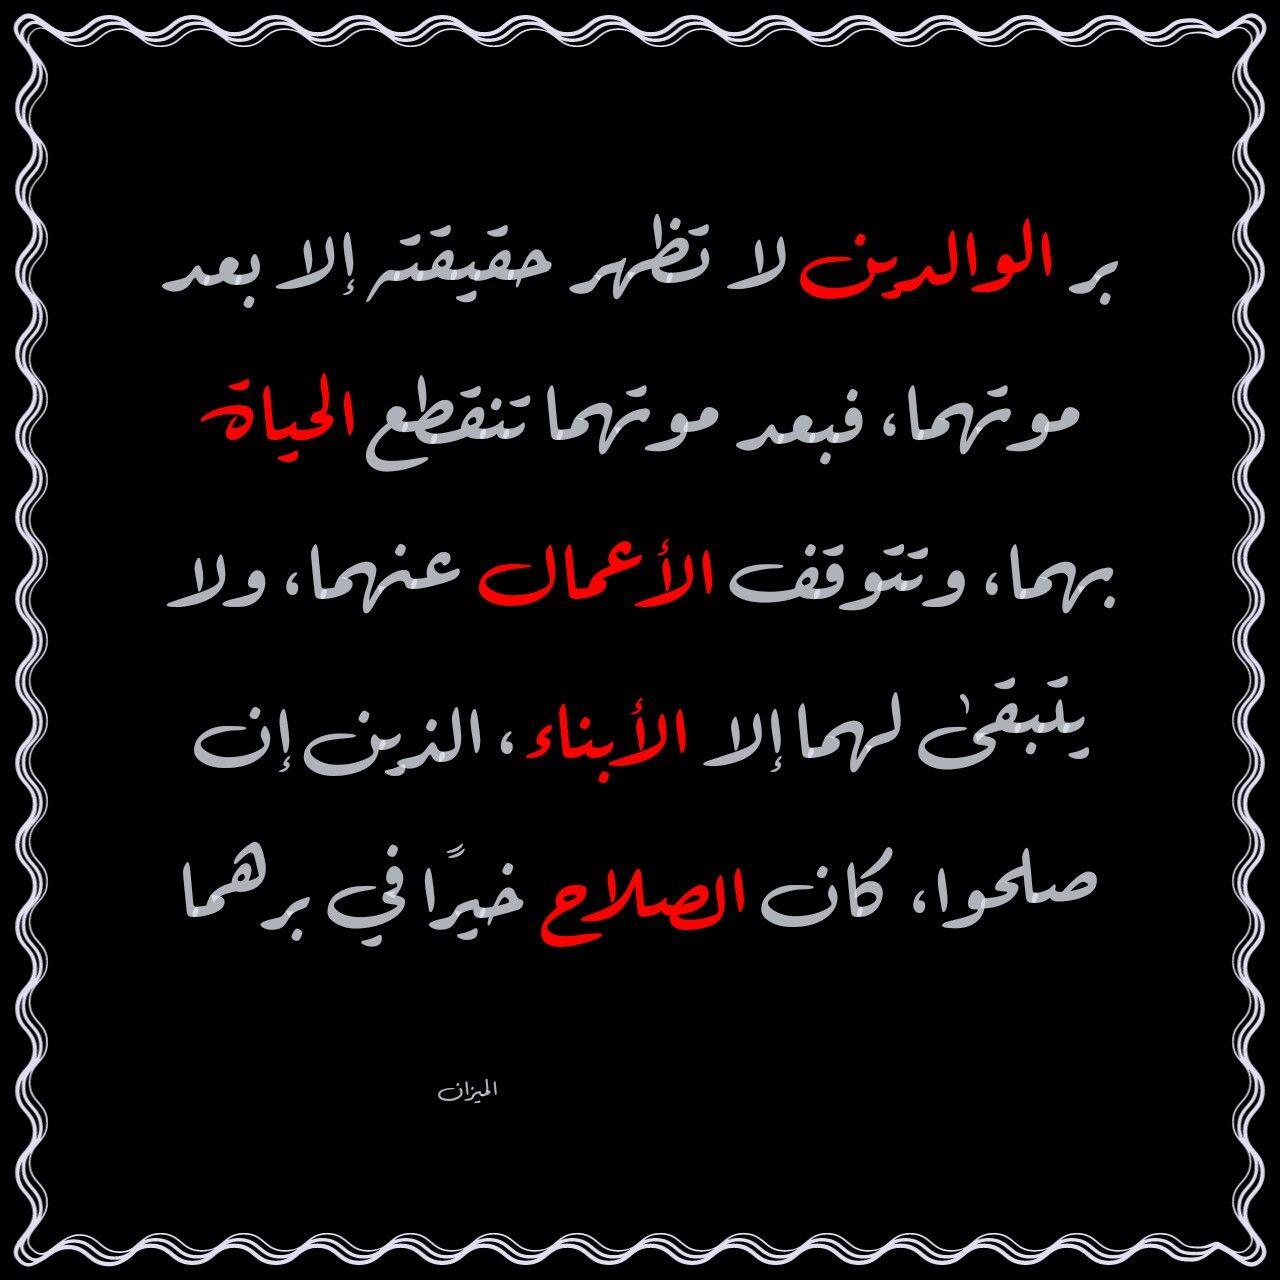 Pin By Al Mizan On الــ ـمـ ــيزان Al Mizan Arabic Calligraphy Calligraphy